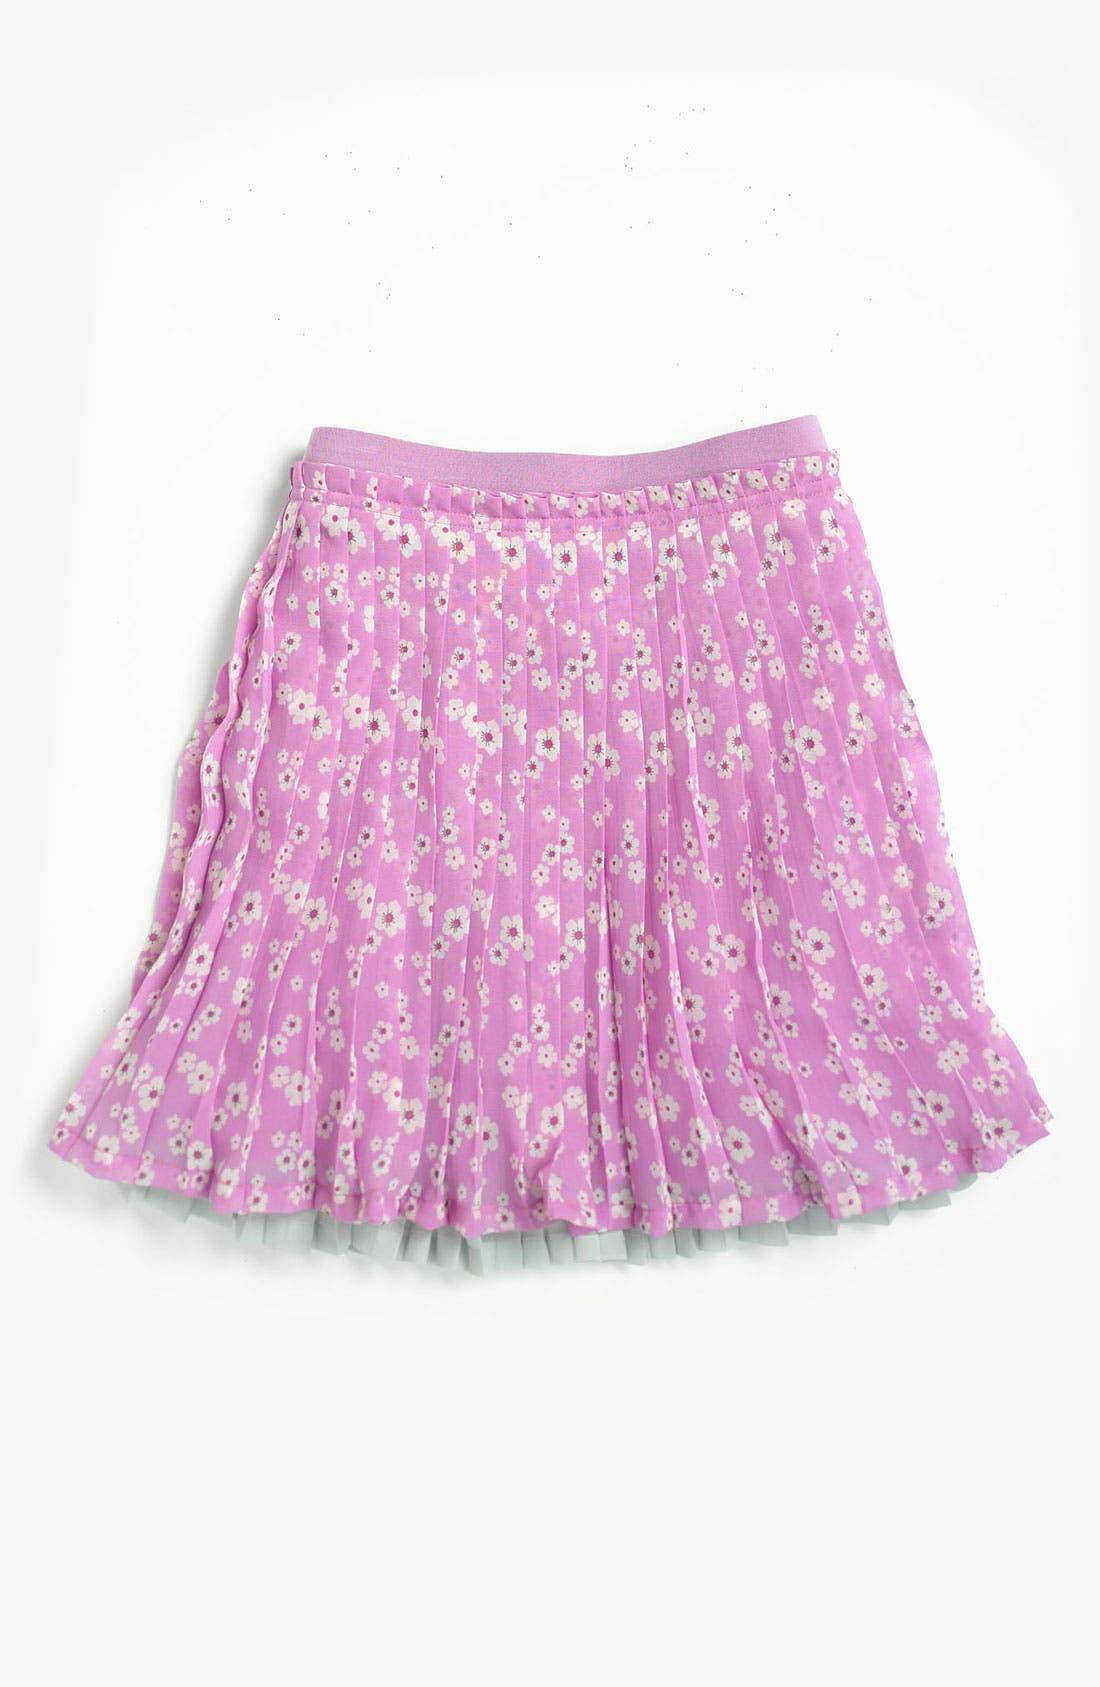 Main Image - Ruby & Bloom 'Chloé' Pleated Skirt (Big Girls)